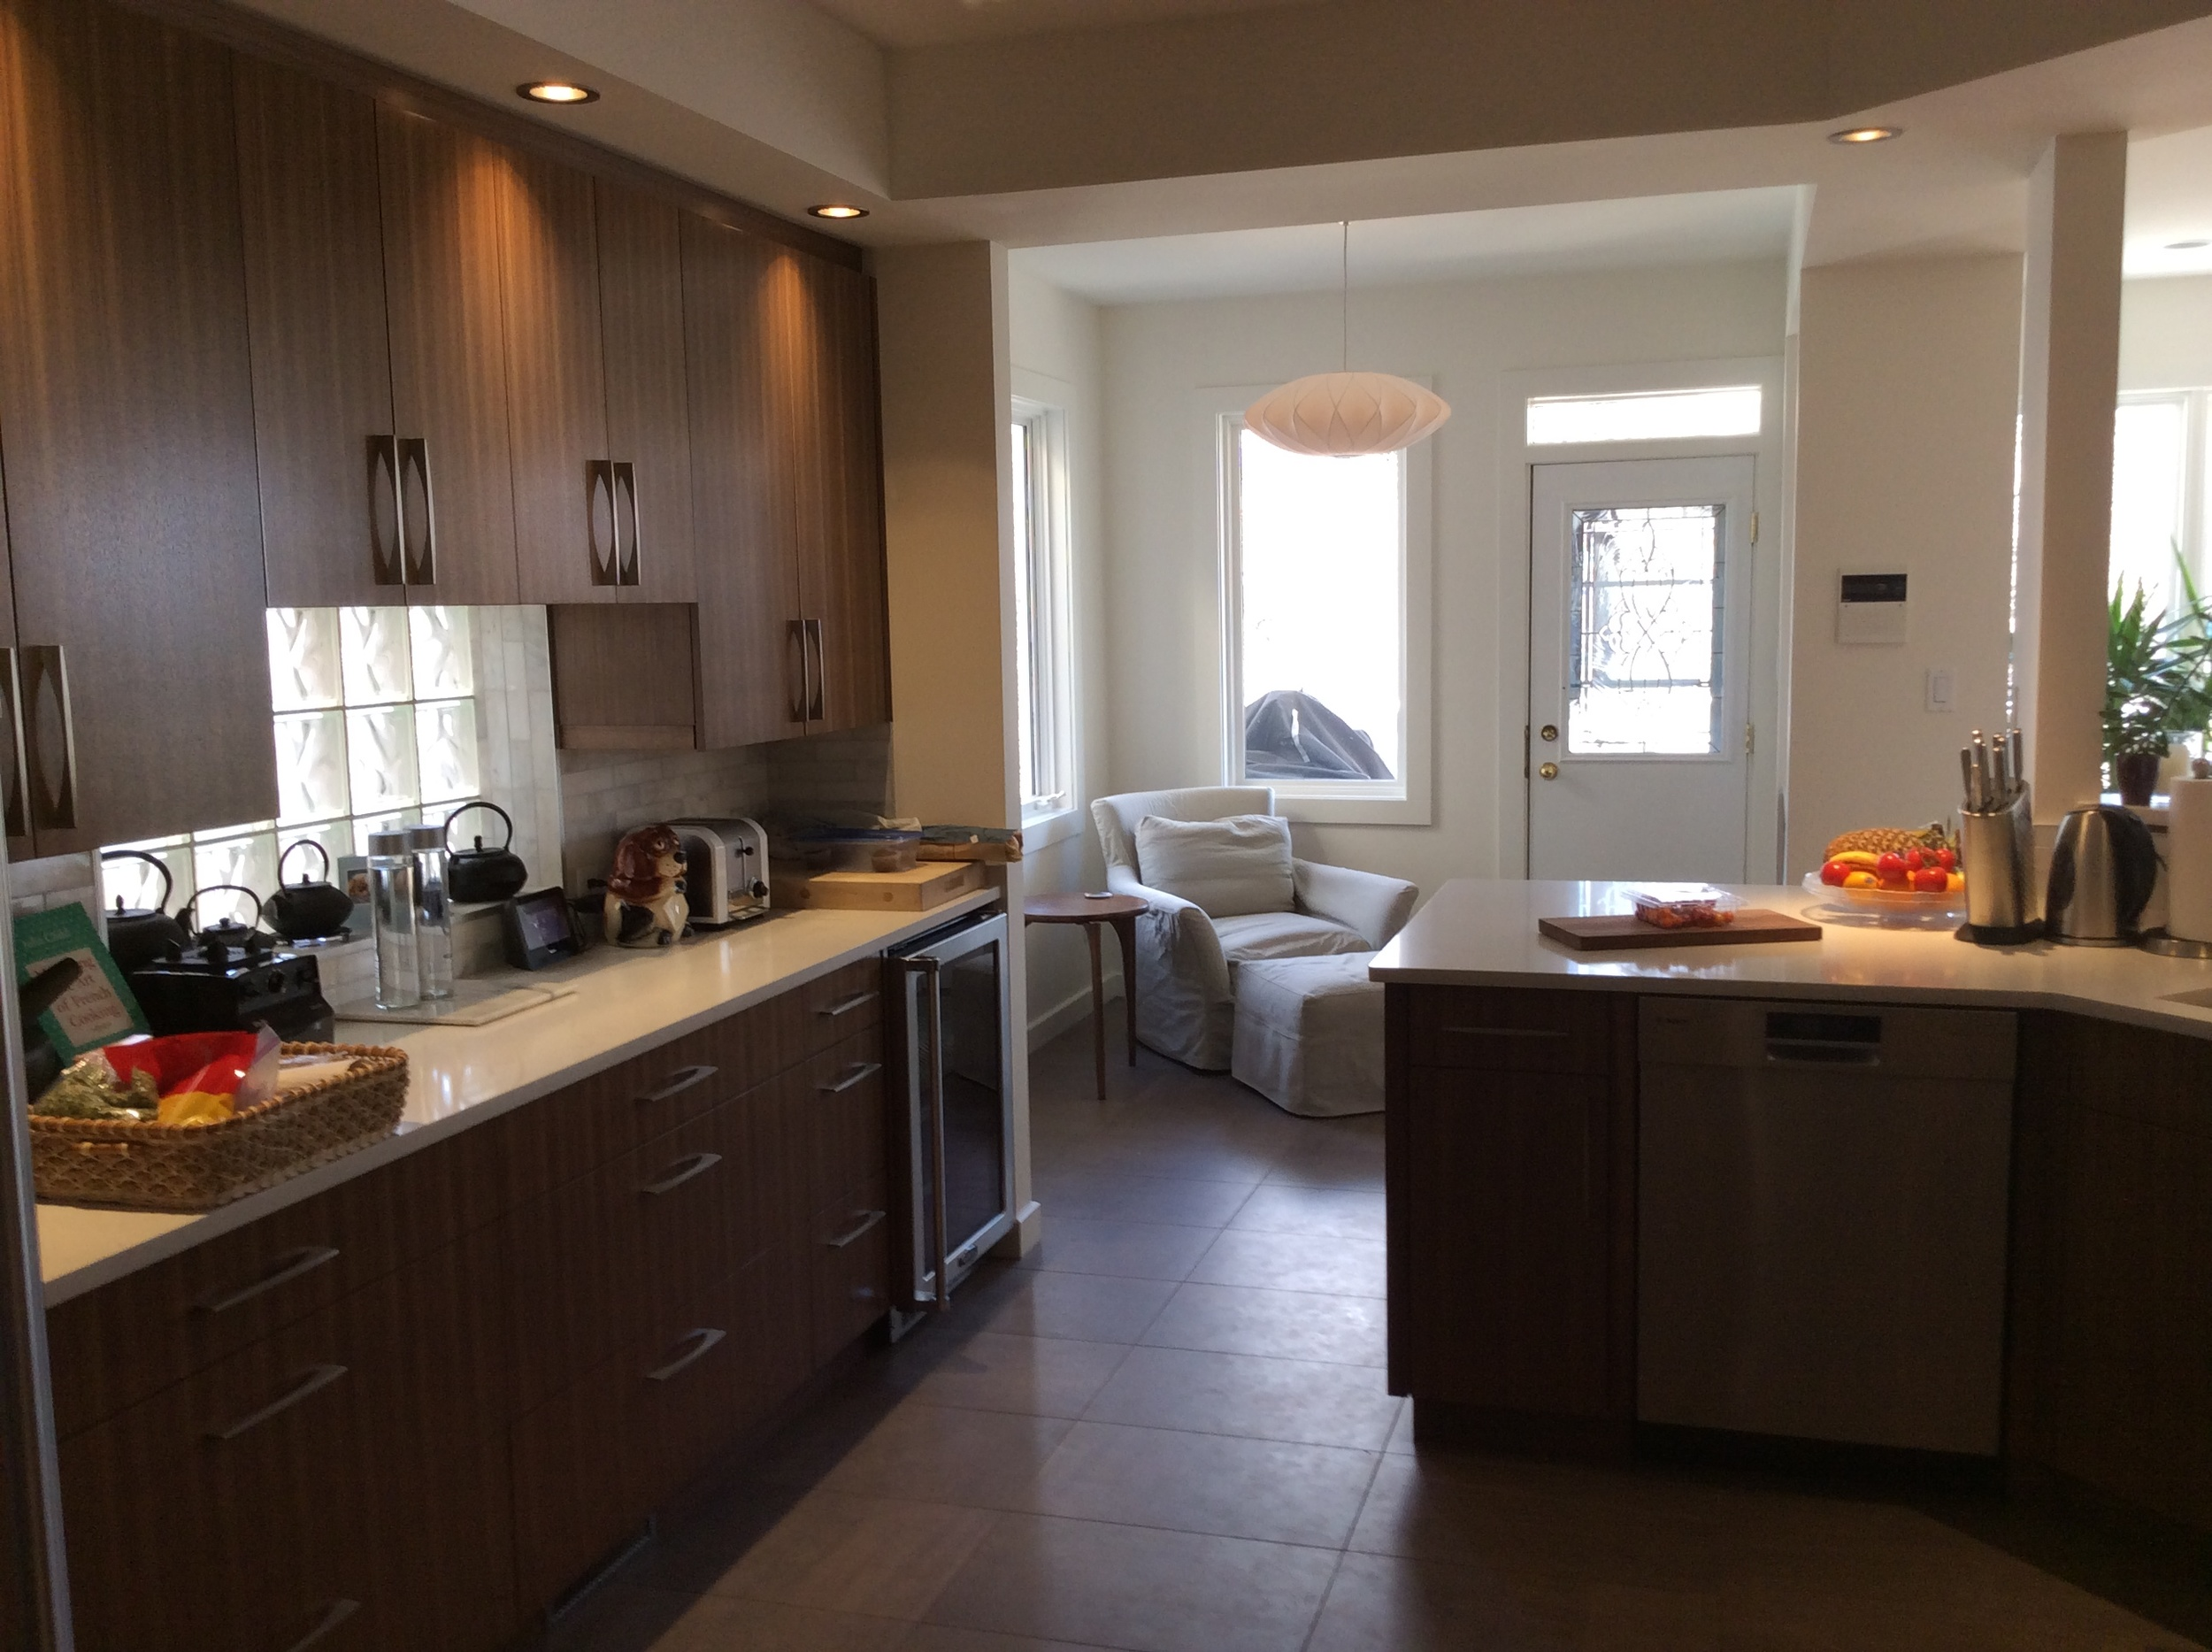 Custom Walnut cabinets, quartz countertops, bianco carrara backsplash, George Nelson bubble lamp.